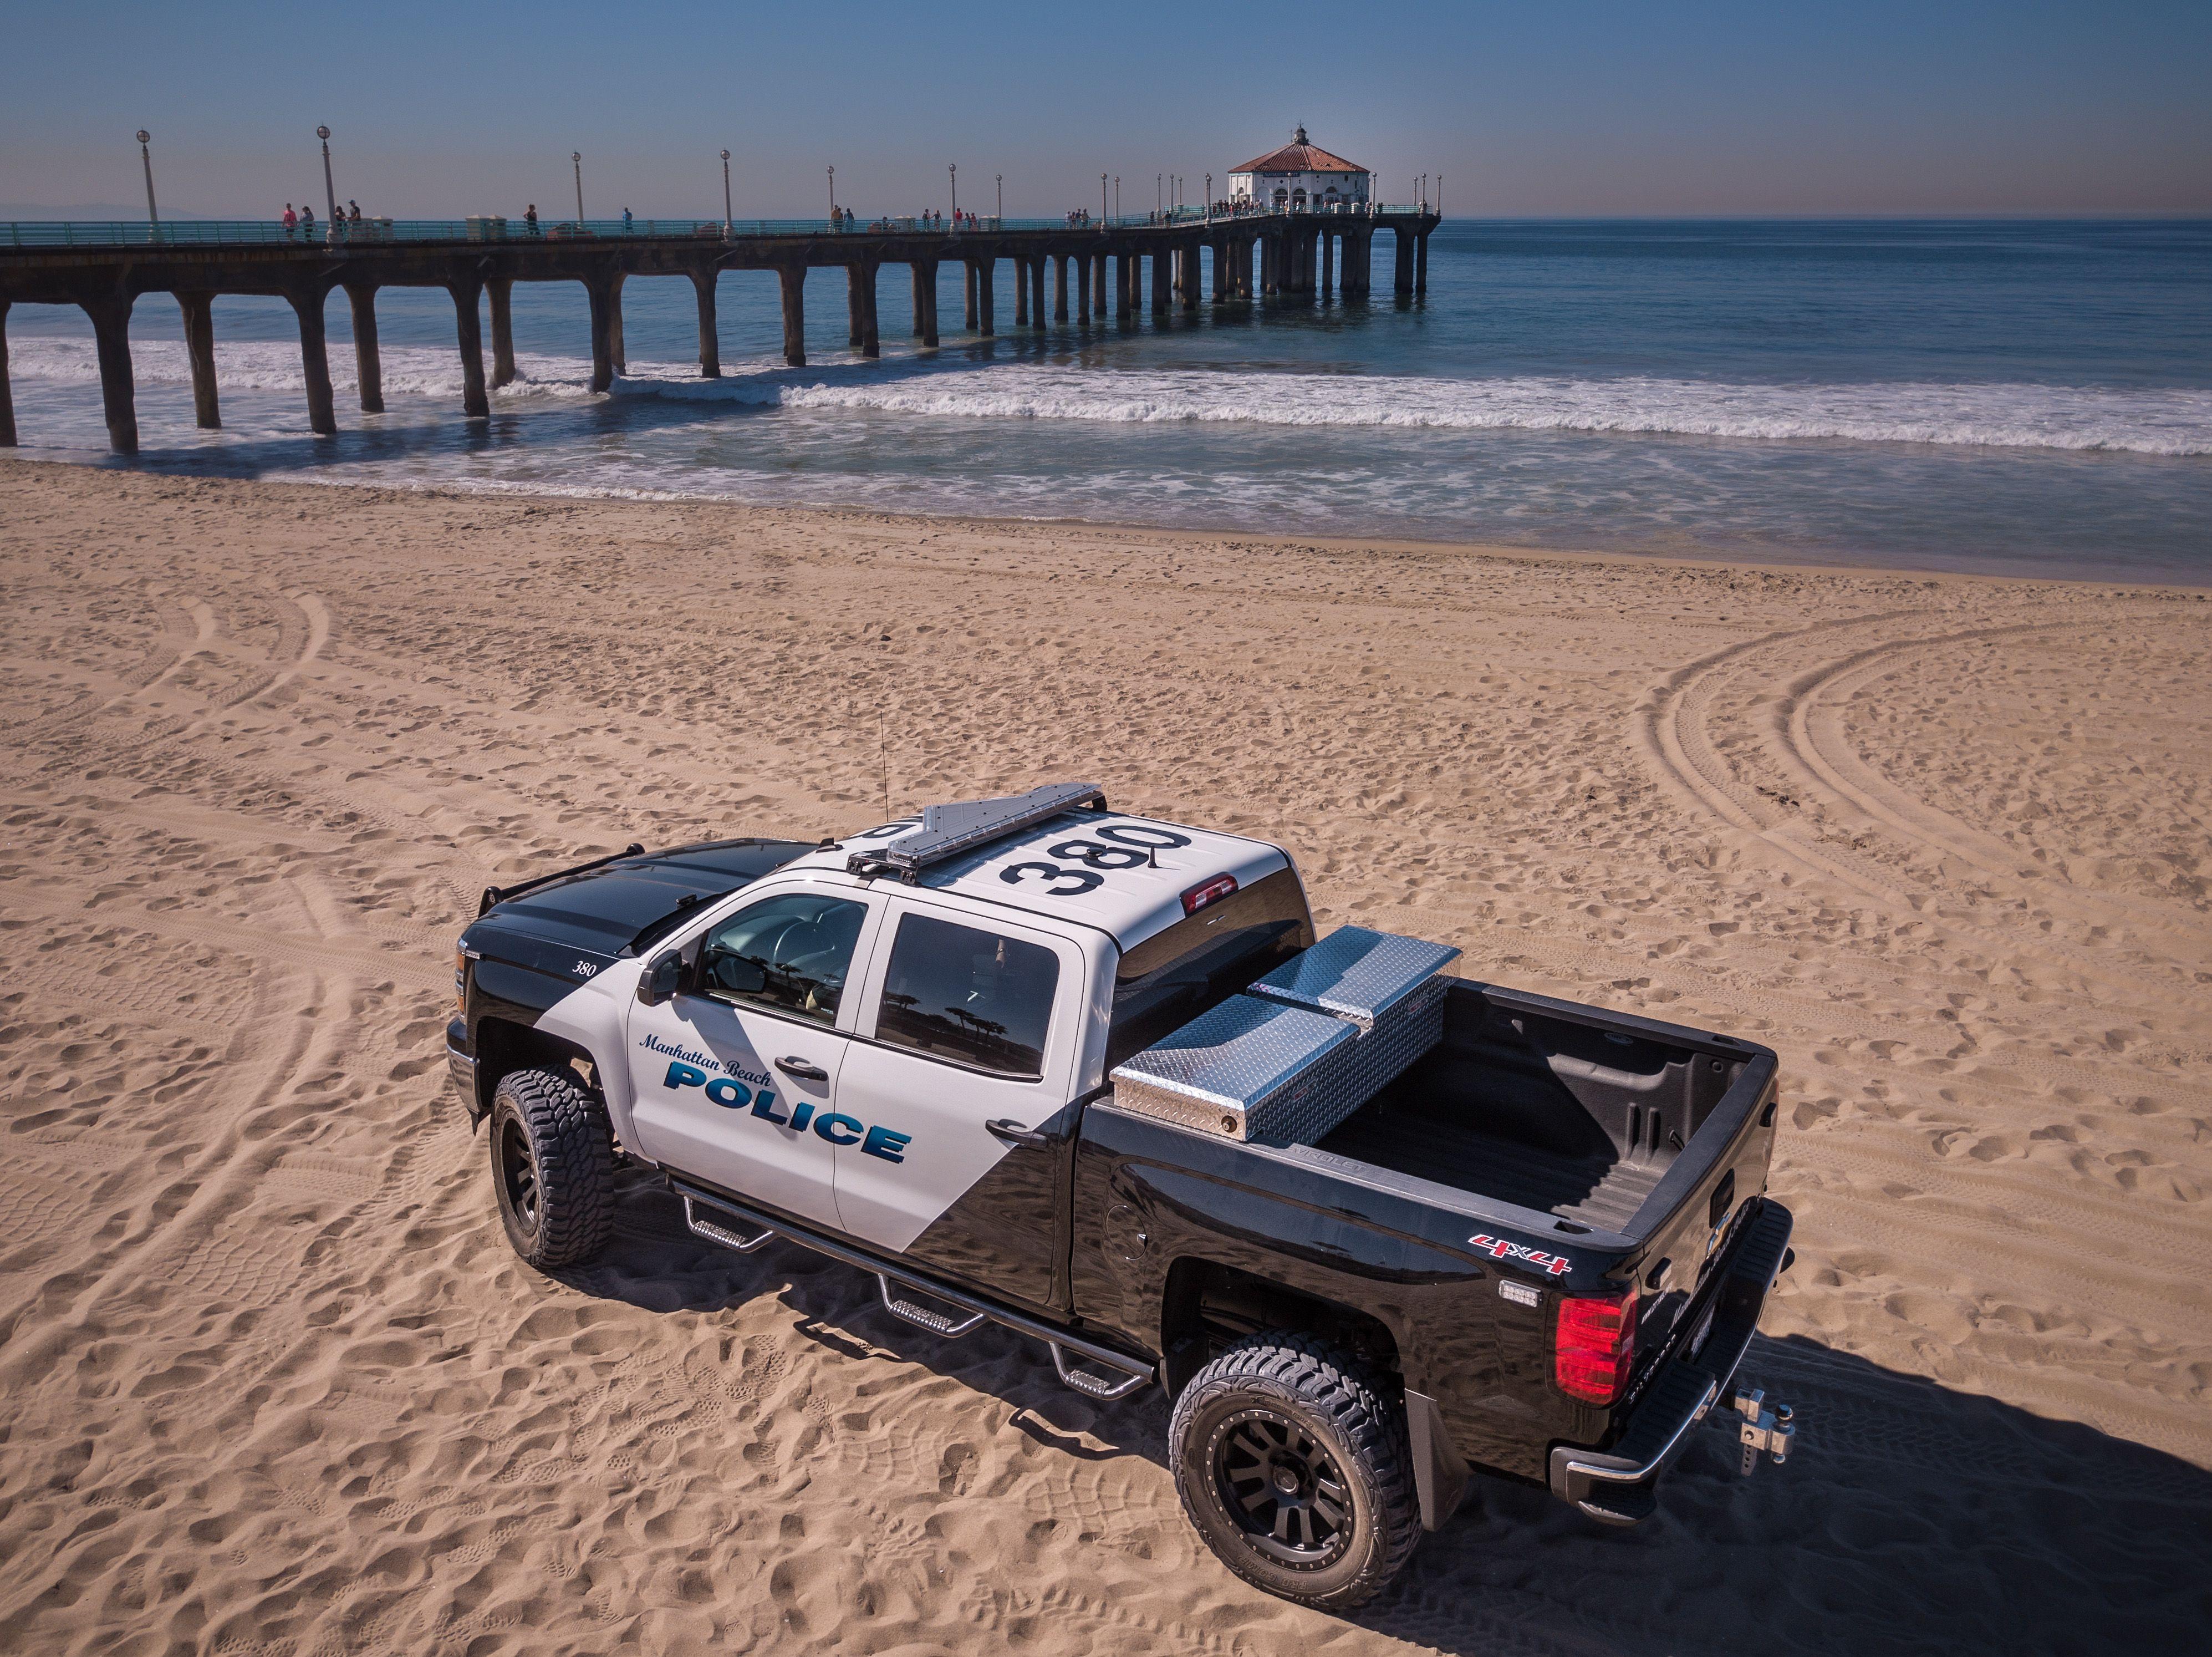 MBPD_Beach Truck.jpg